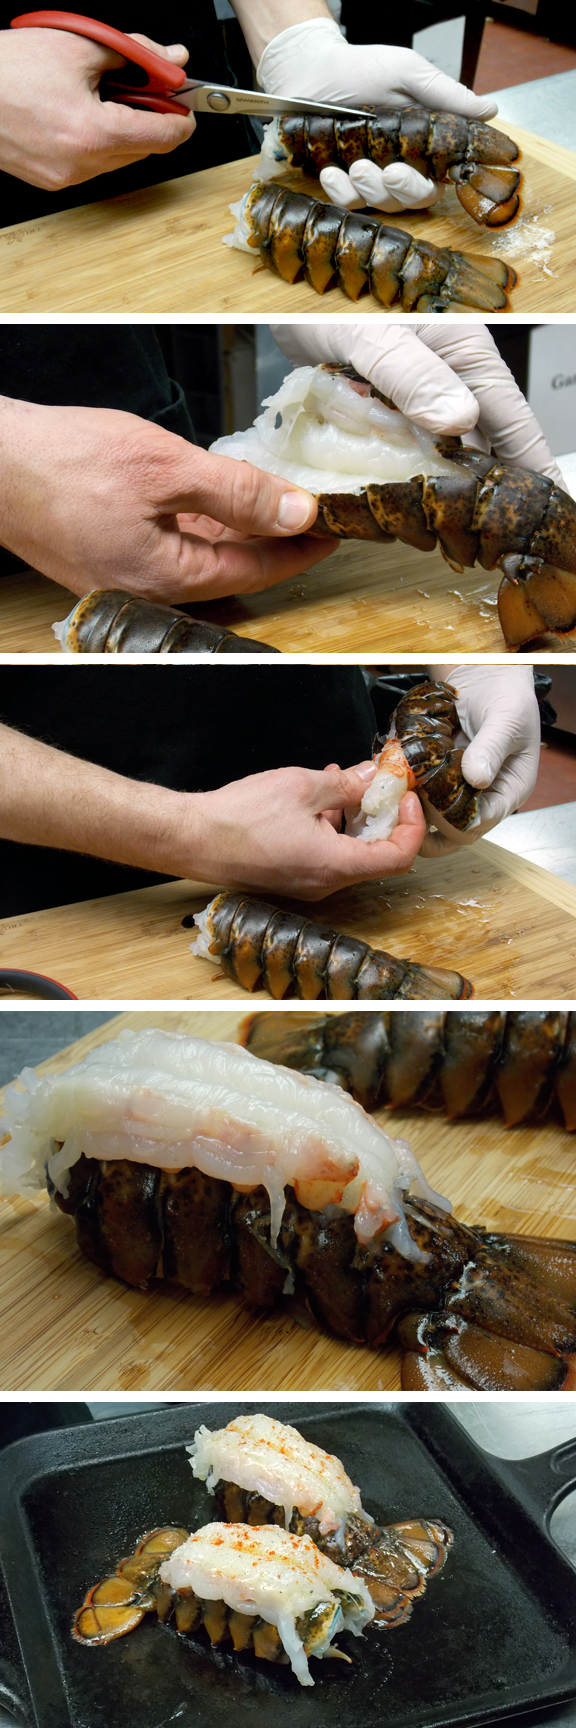 Steps for preparing lobster tail